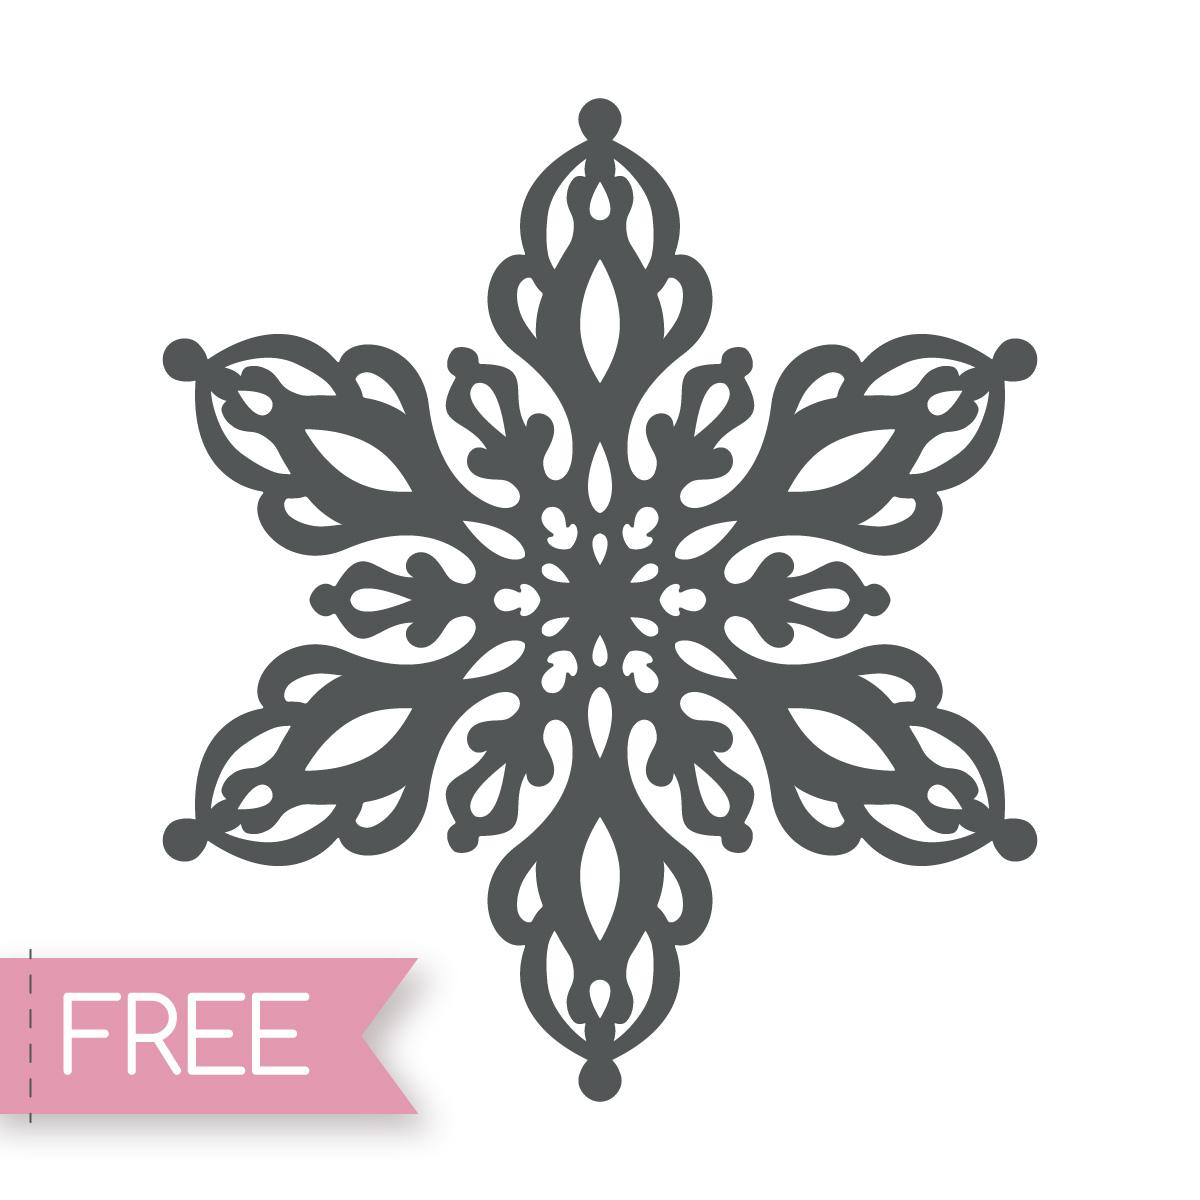 Snowflake free Cricut svg cut file